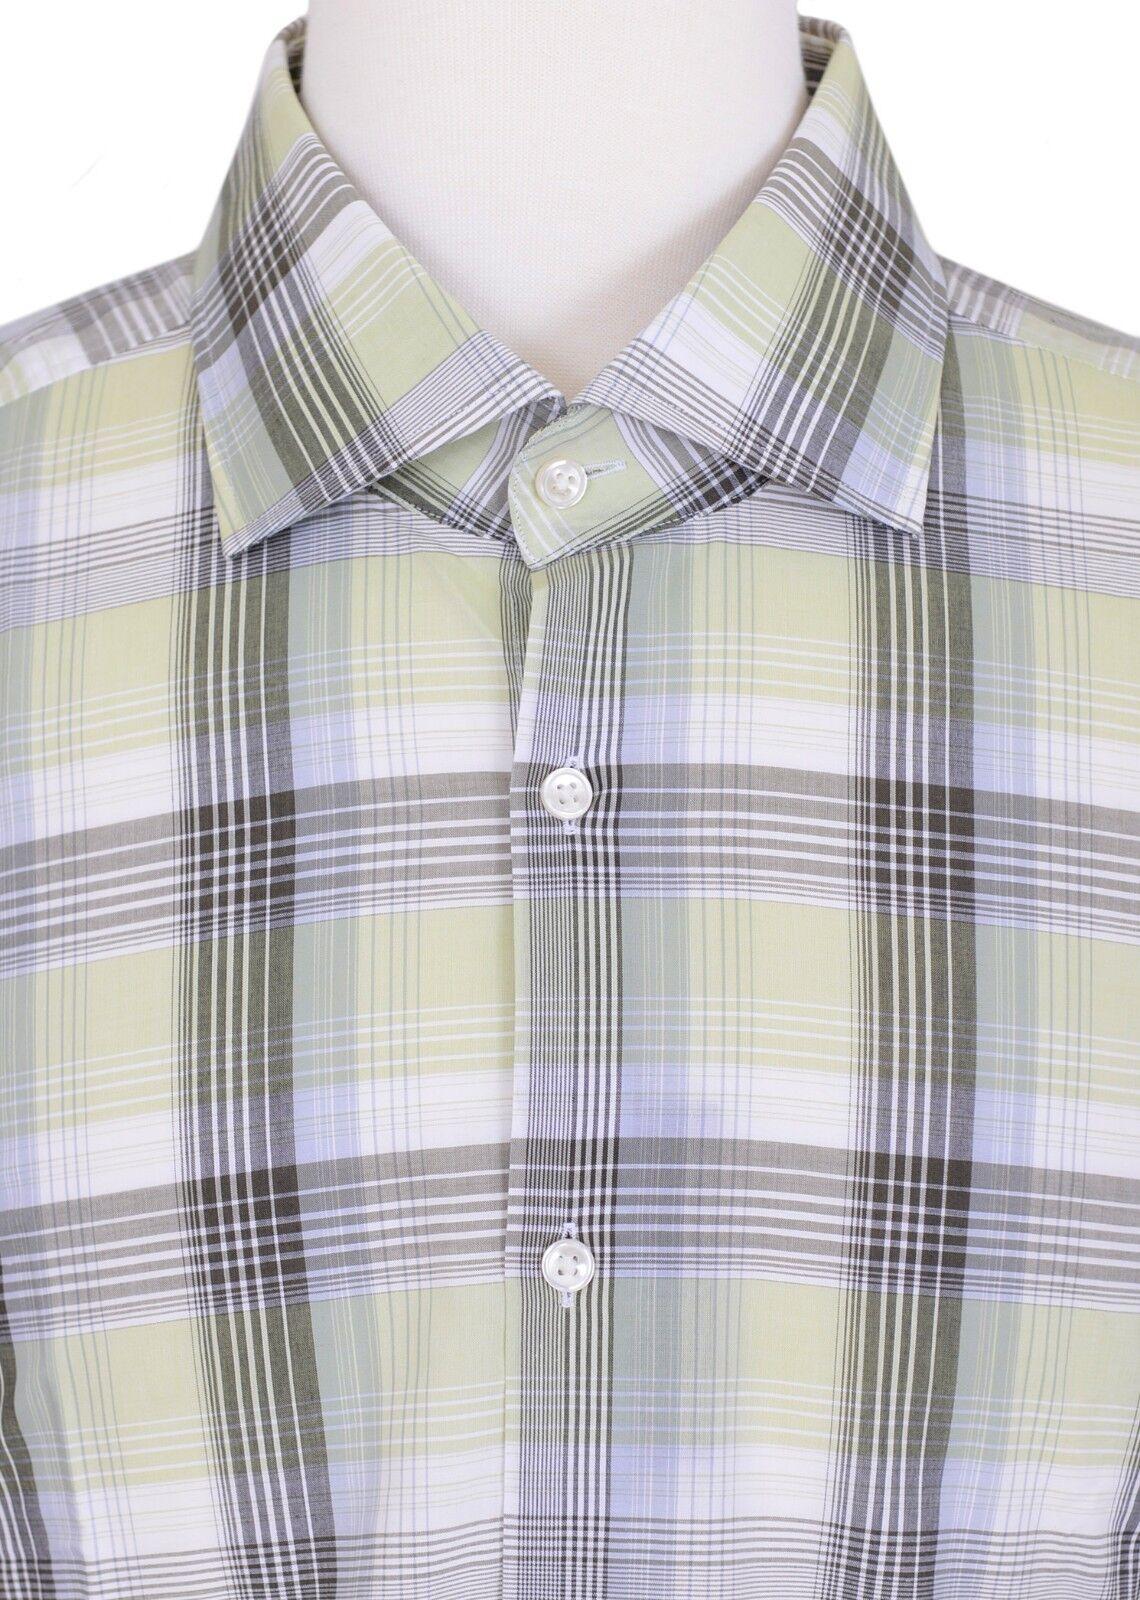 Hugo Boss Jaron US Slim Fit Italian Fabric Green Plaid Dress Shirt 16 36 37